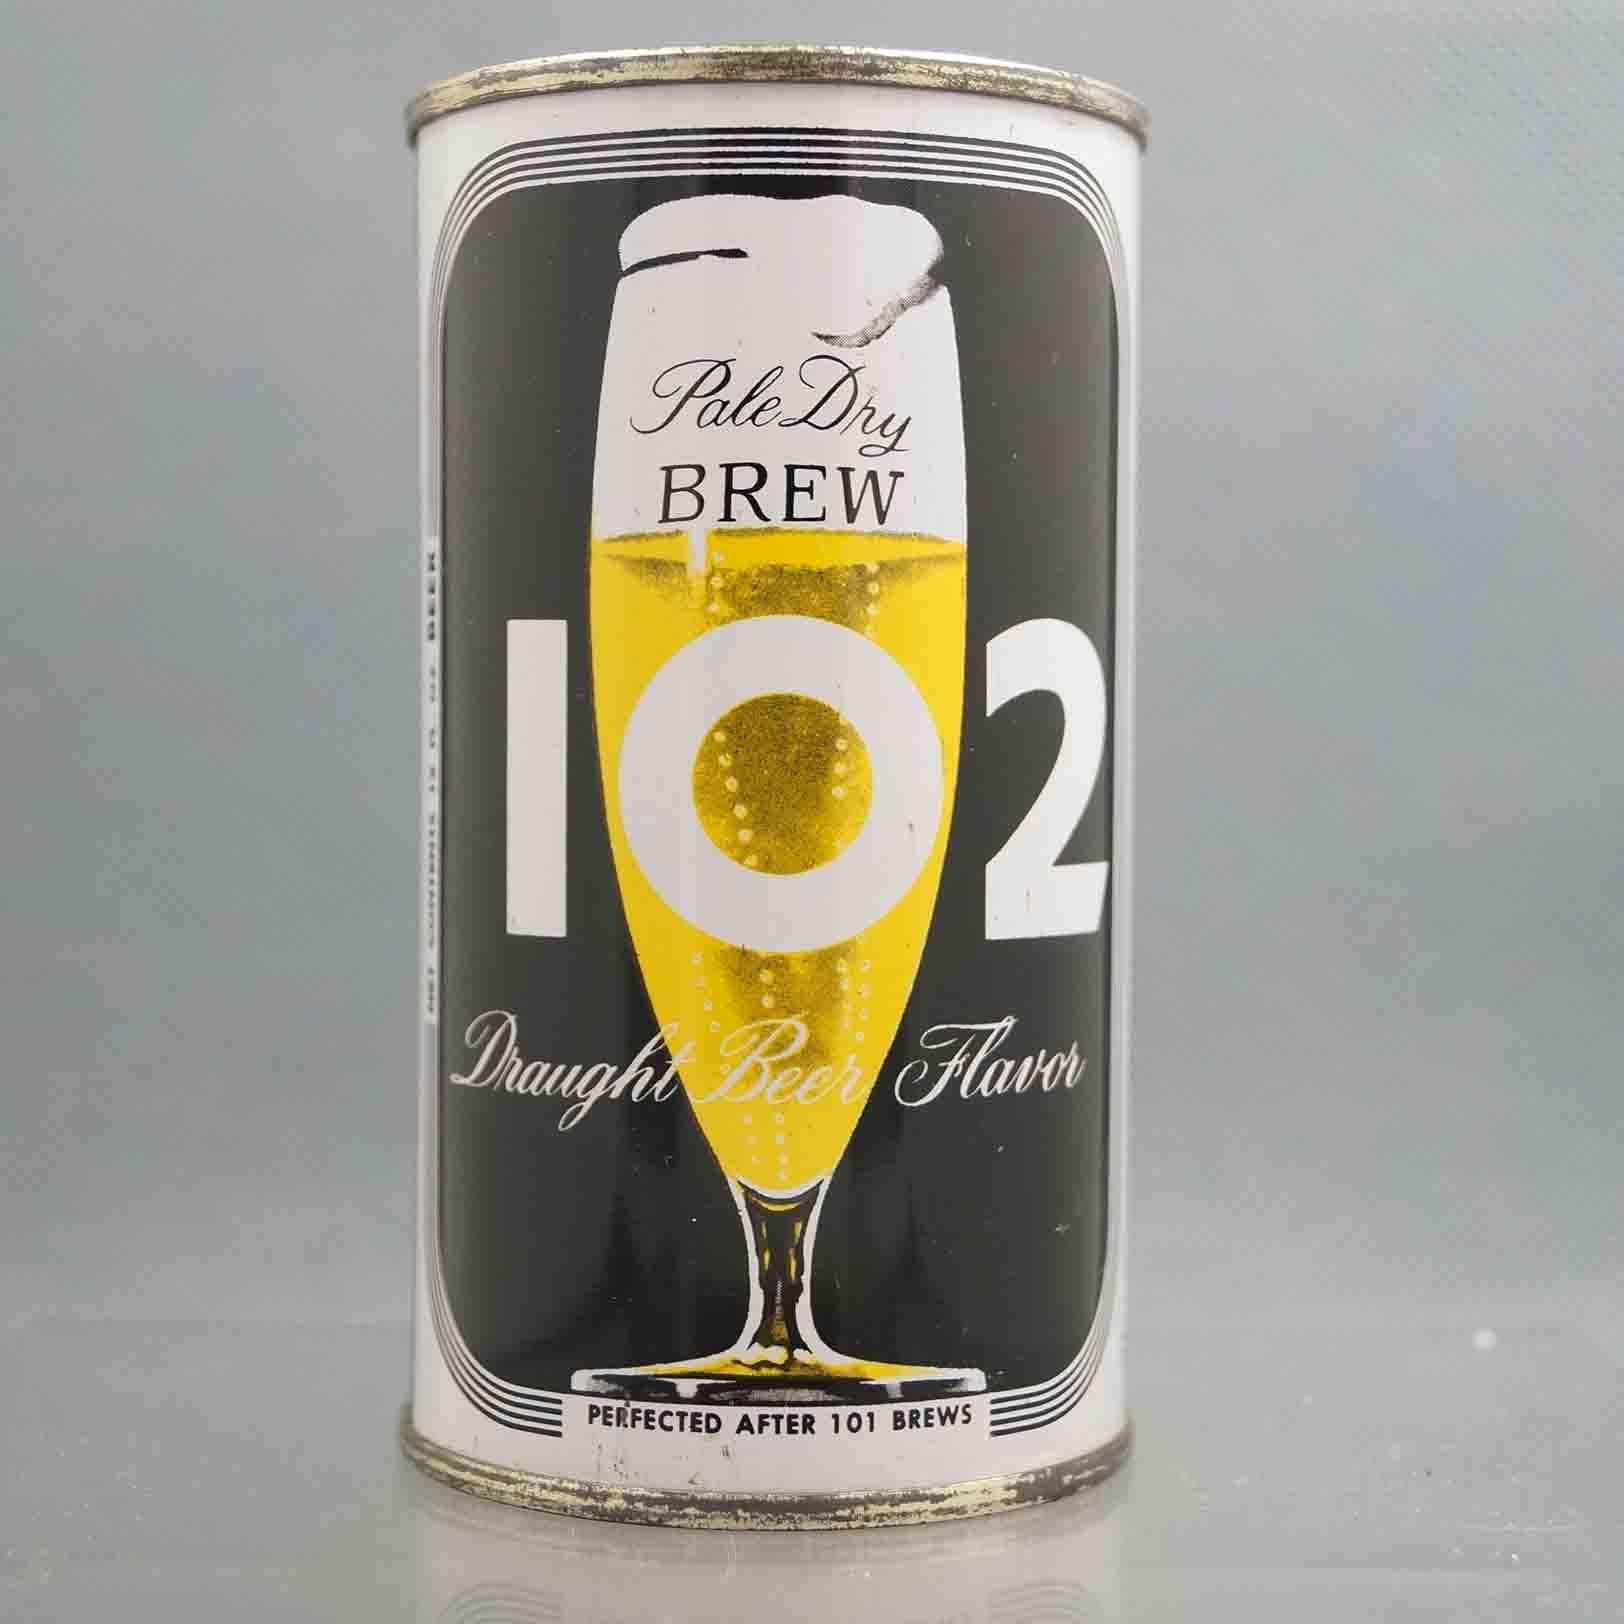 102 Pale Dry Brew